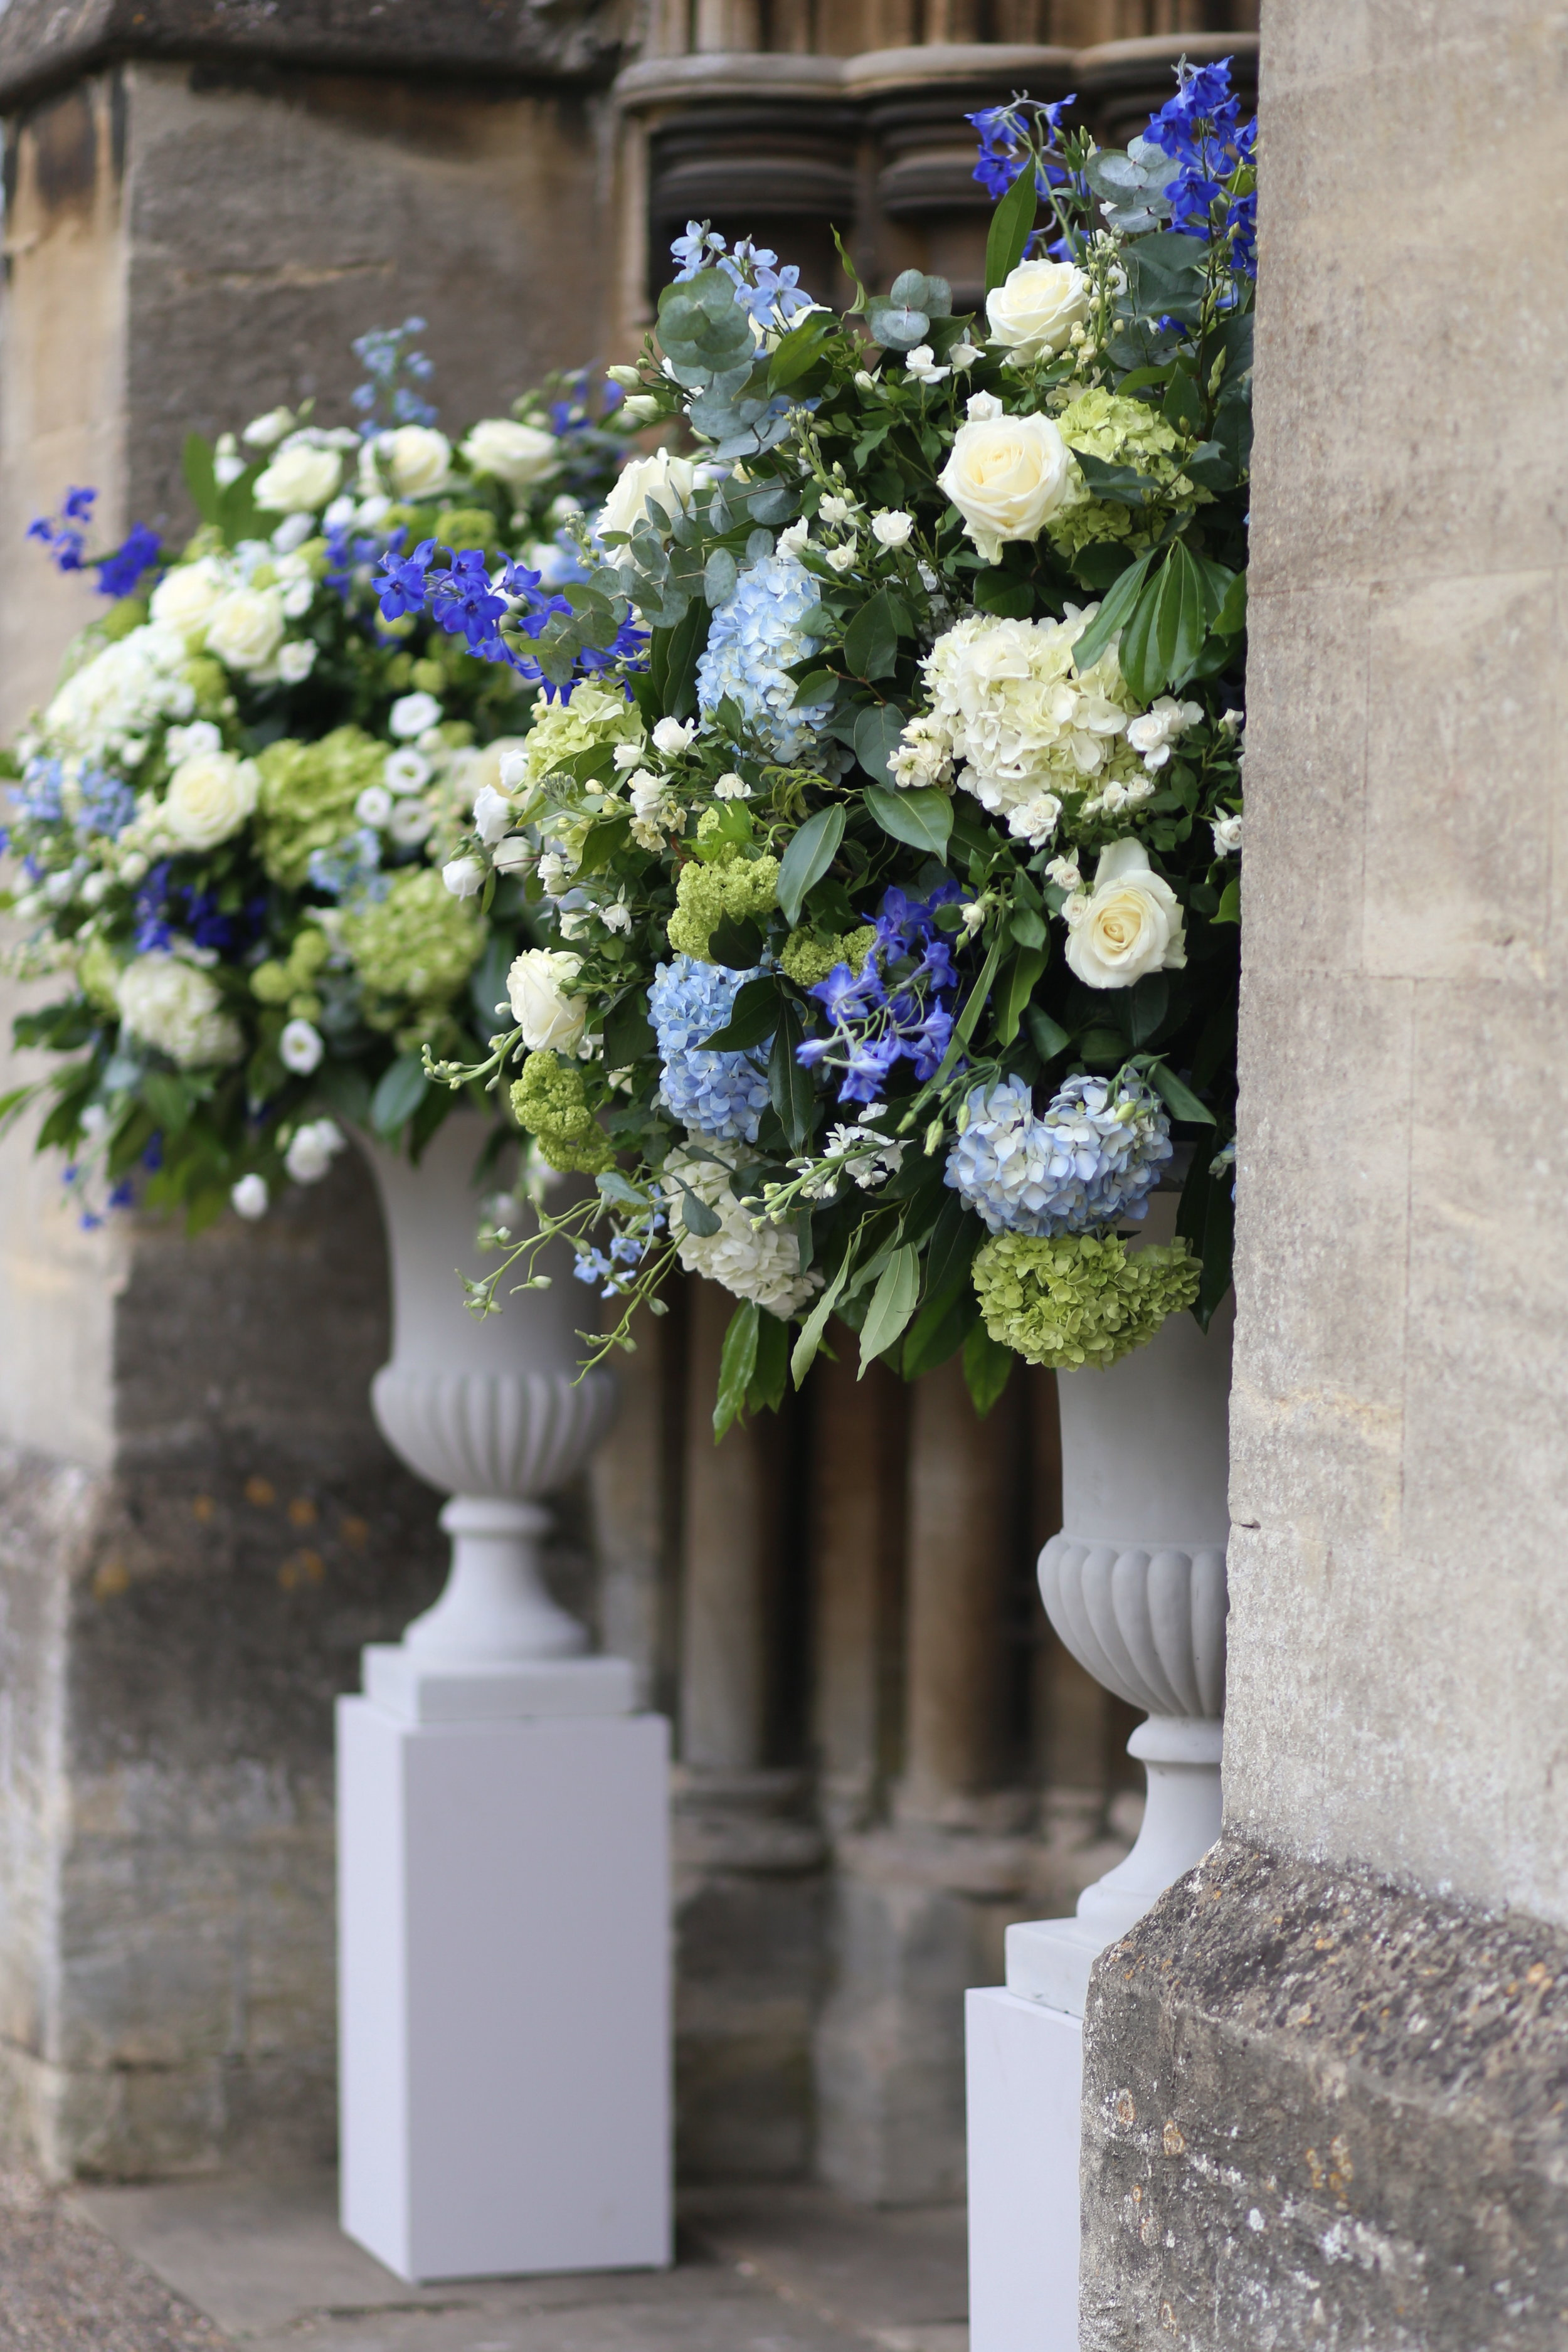 MIRIAM_FAITH_WEDDING_FLOWERS_CEREMONY_URN_CHURCH_PEDESTAL_BLUE_WHITE_GREEN_GREY.JPG